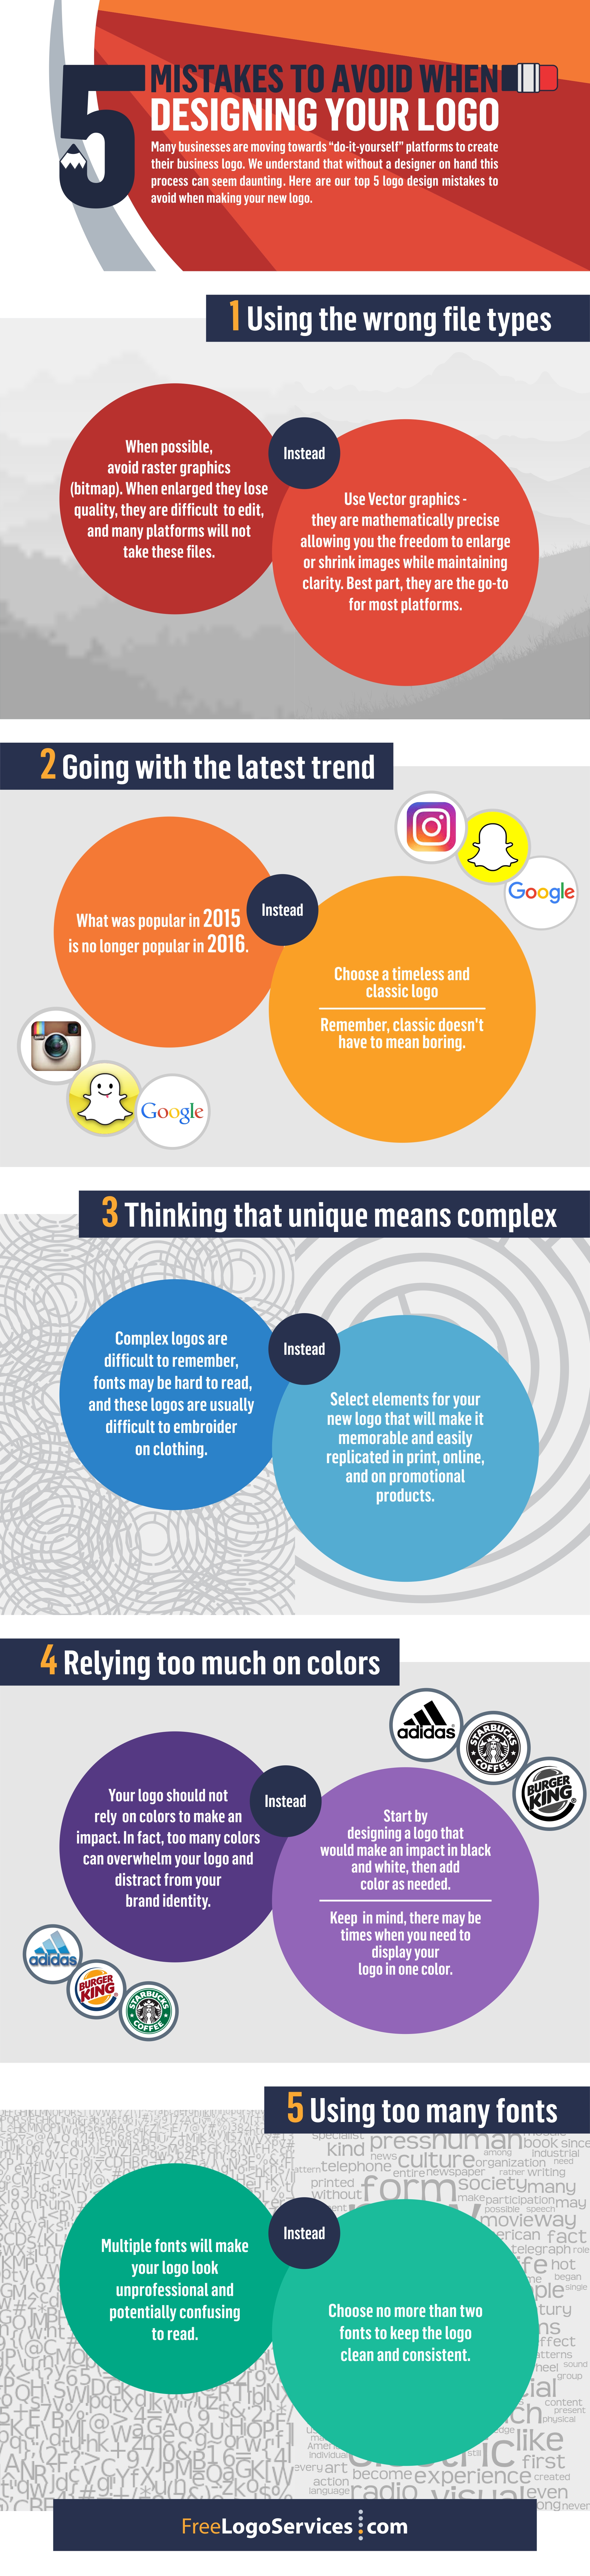 logo_mistakes_infographic